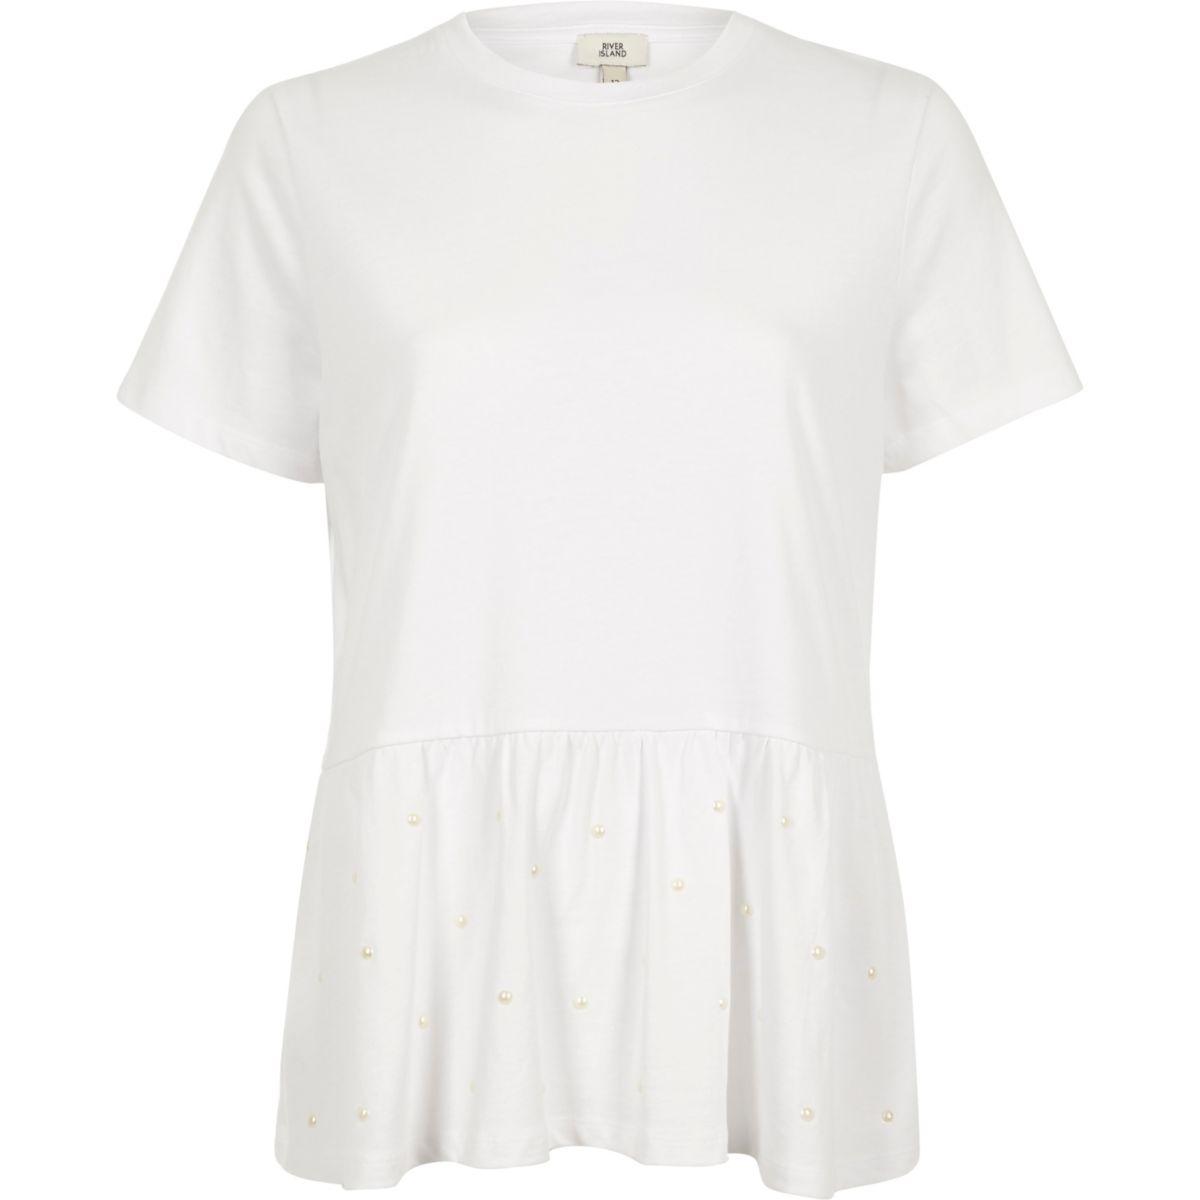 White faux pearl embellished peplum T-shirt